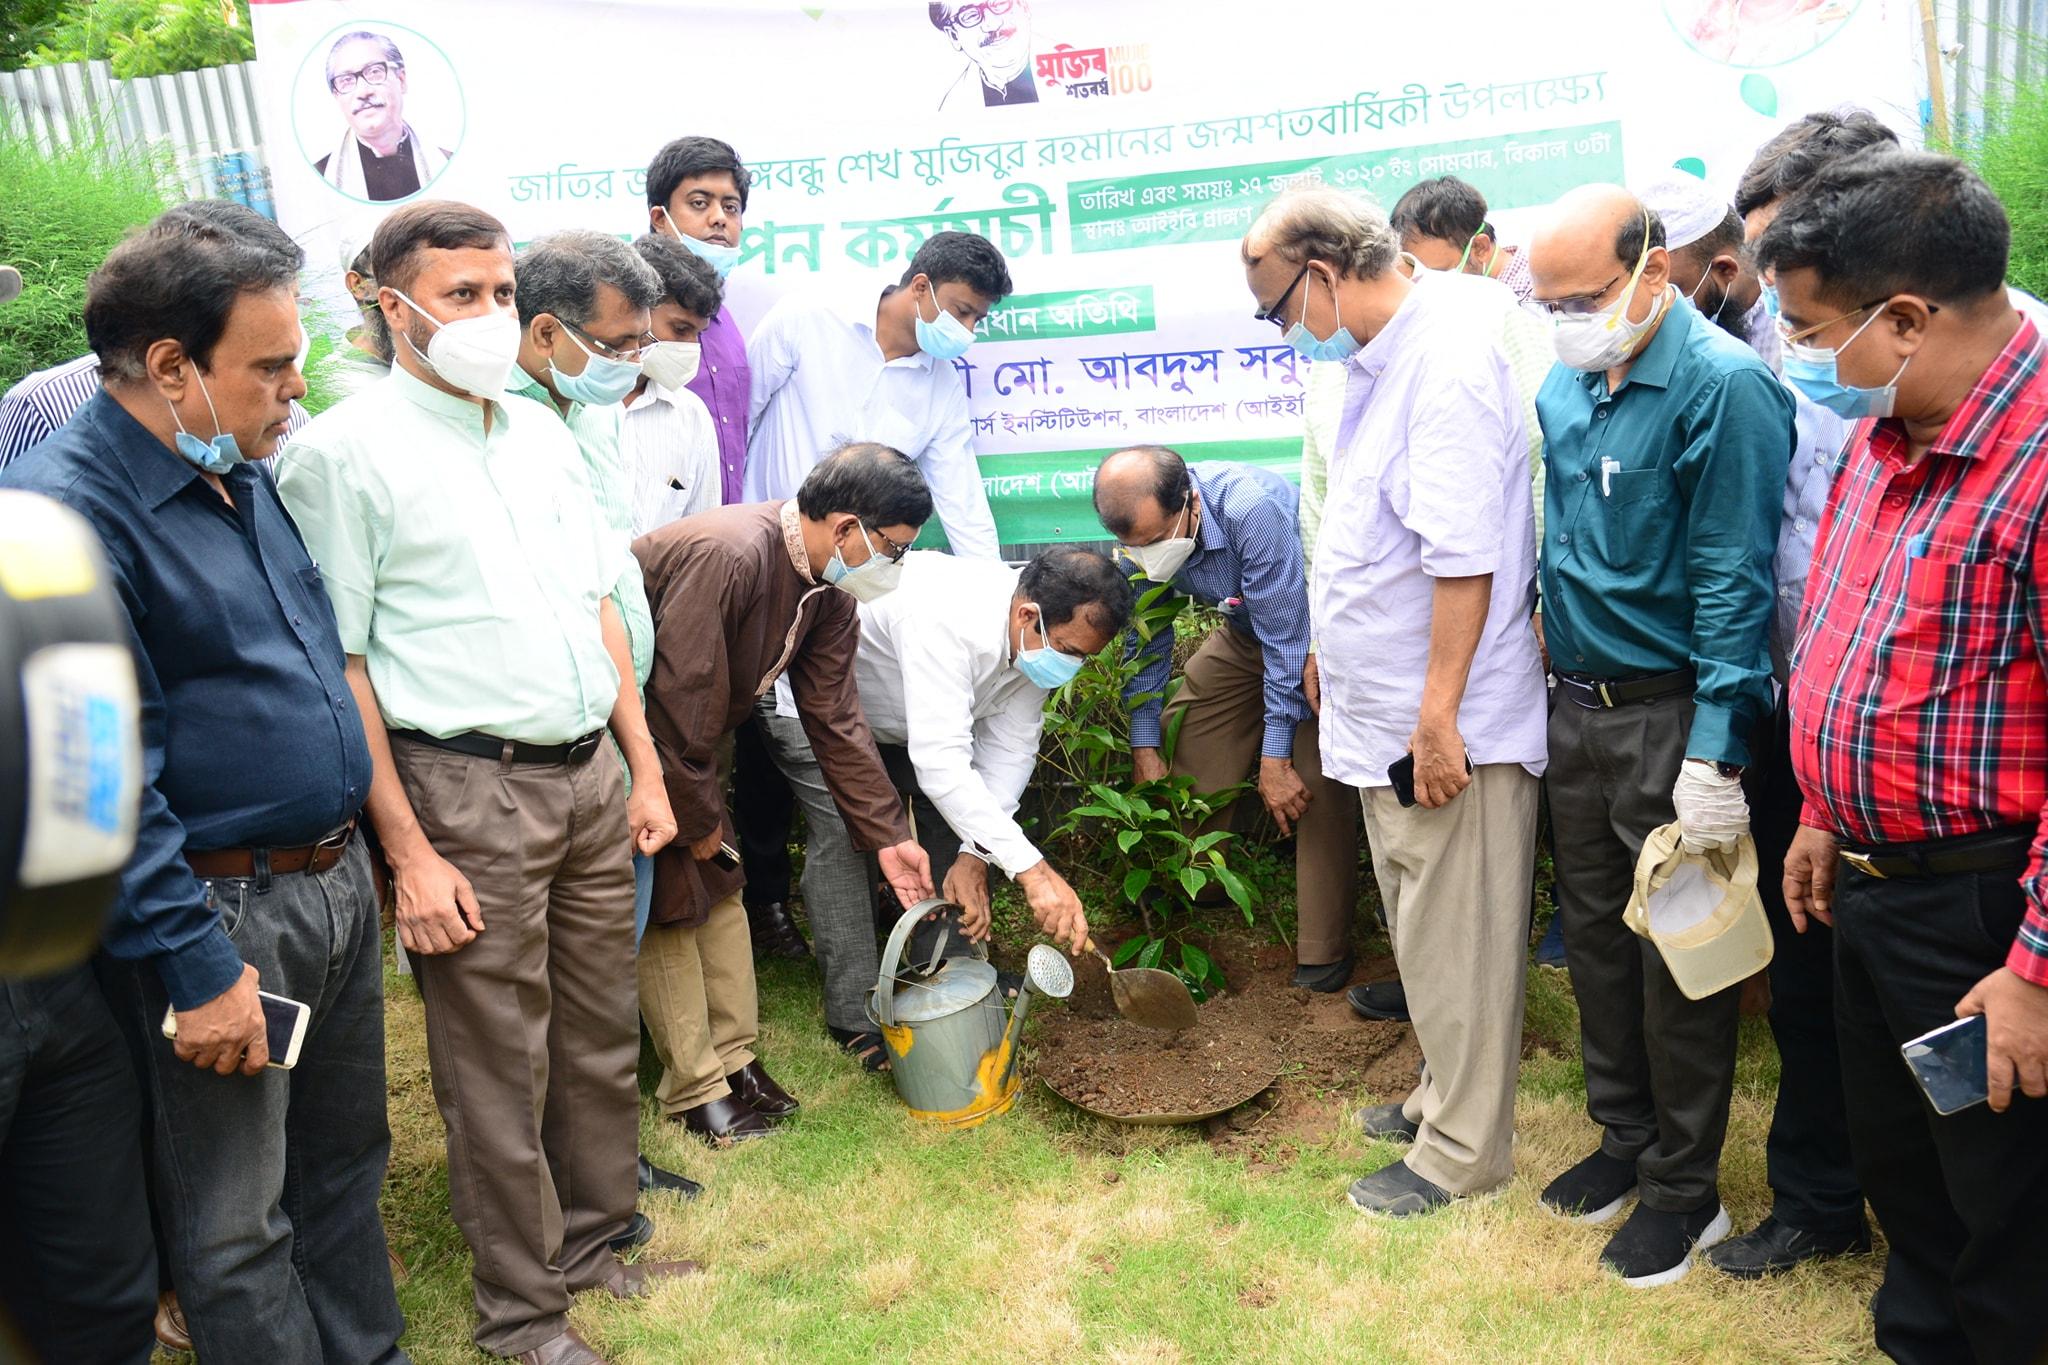 IEB's tree plantation programme marking 'Mujib Year'